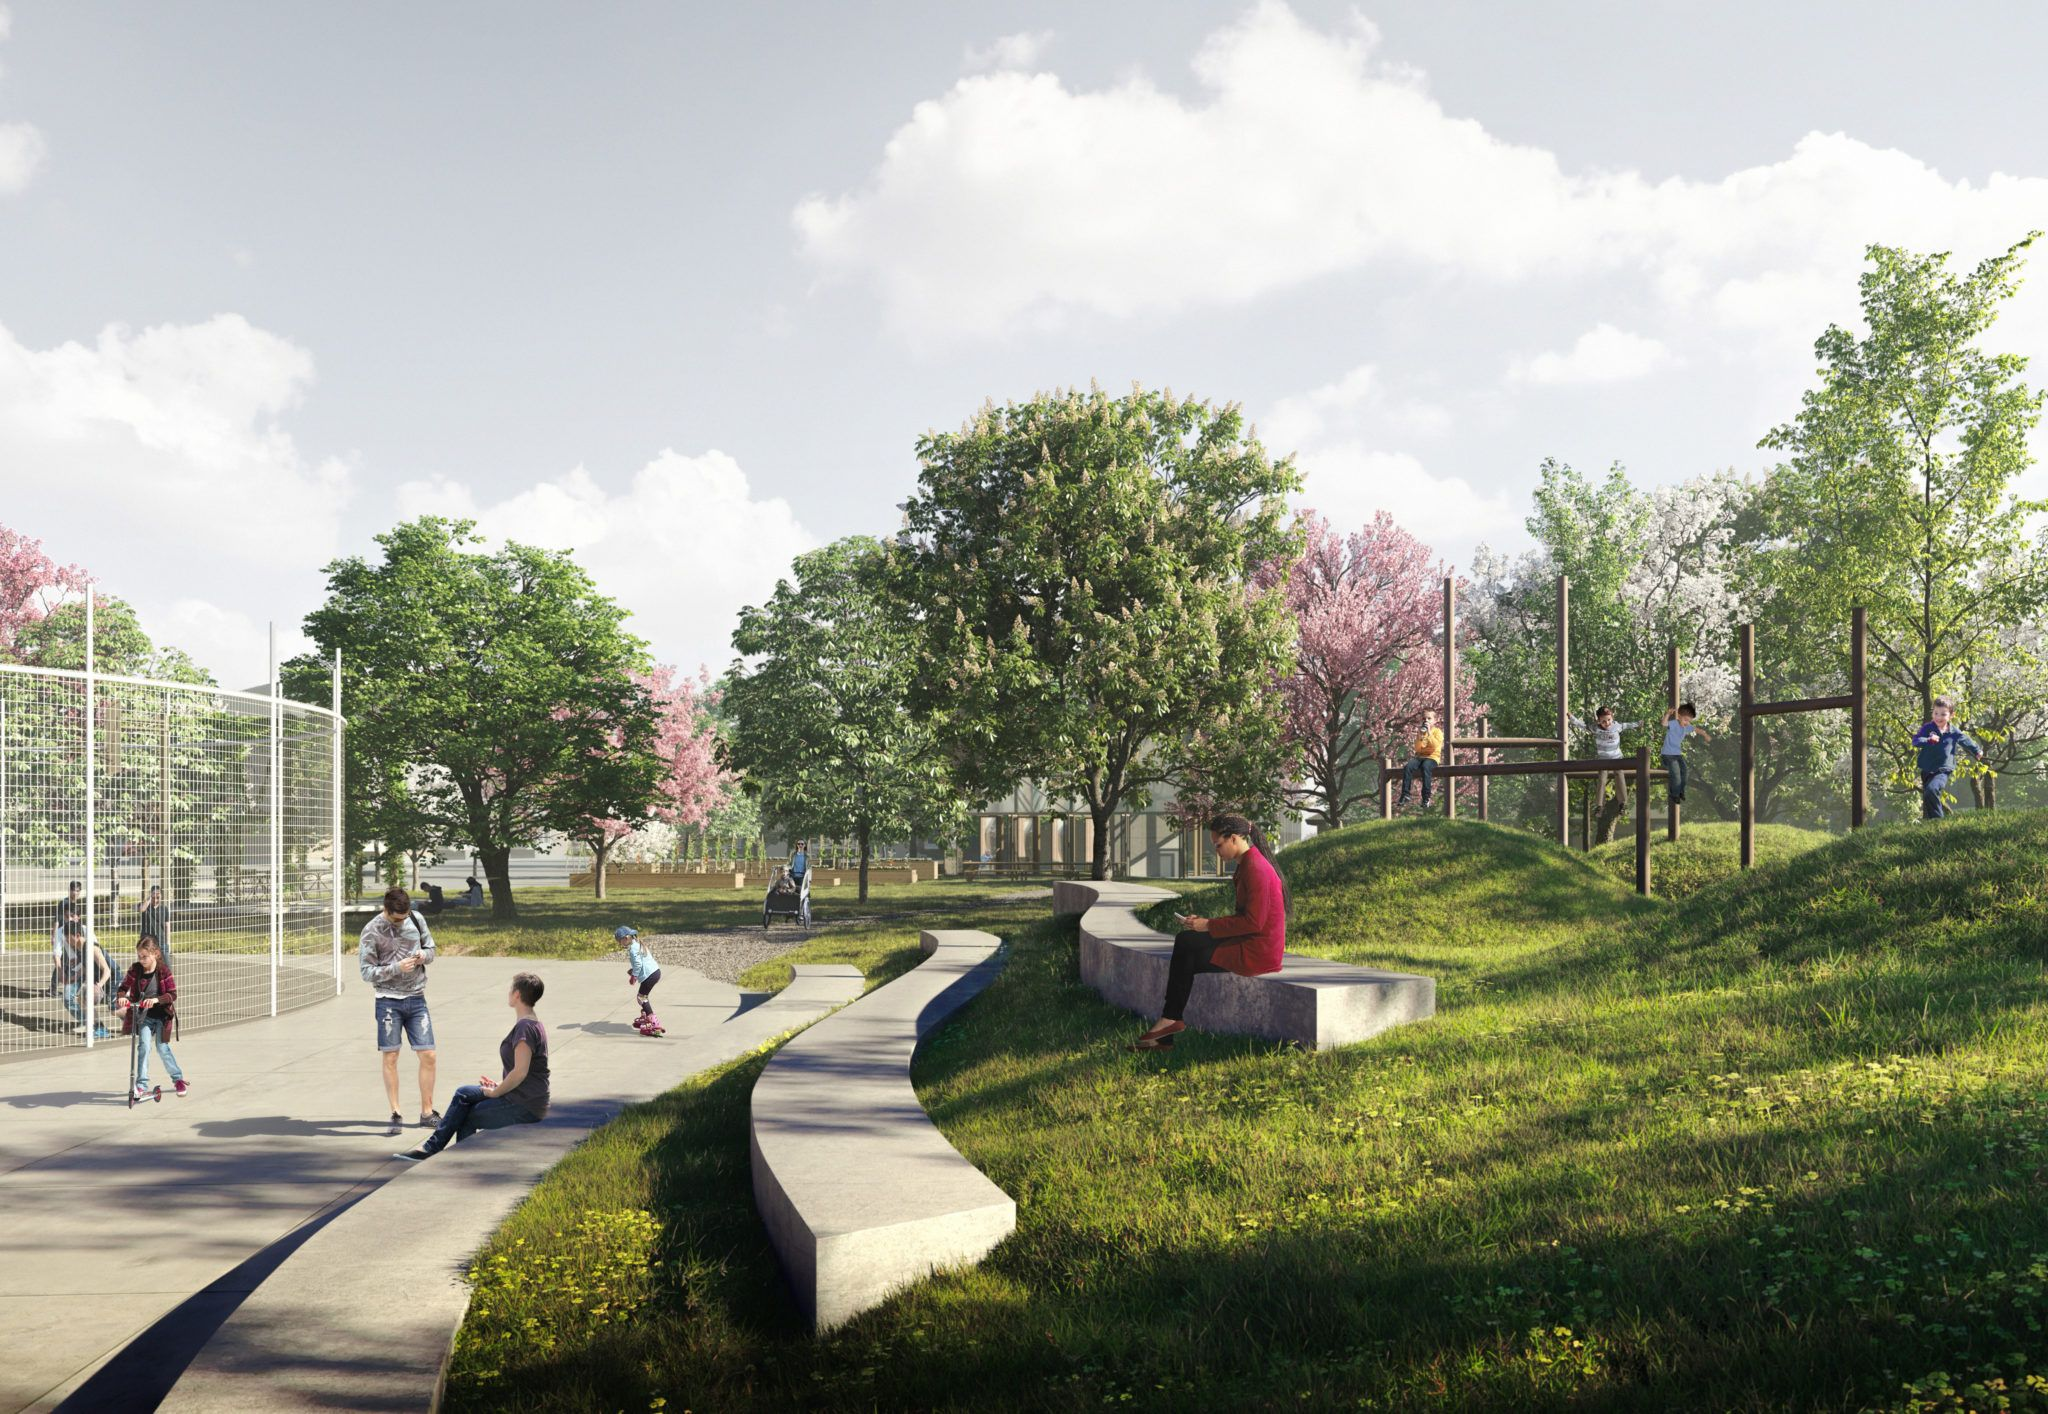 Skitseprojekt for det centrale byrum i Folehavekvarteret_HAVEN_aktivitetspladsen